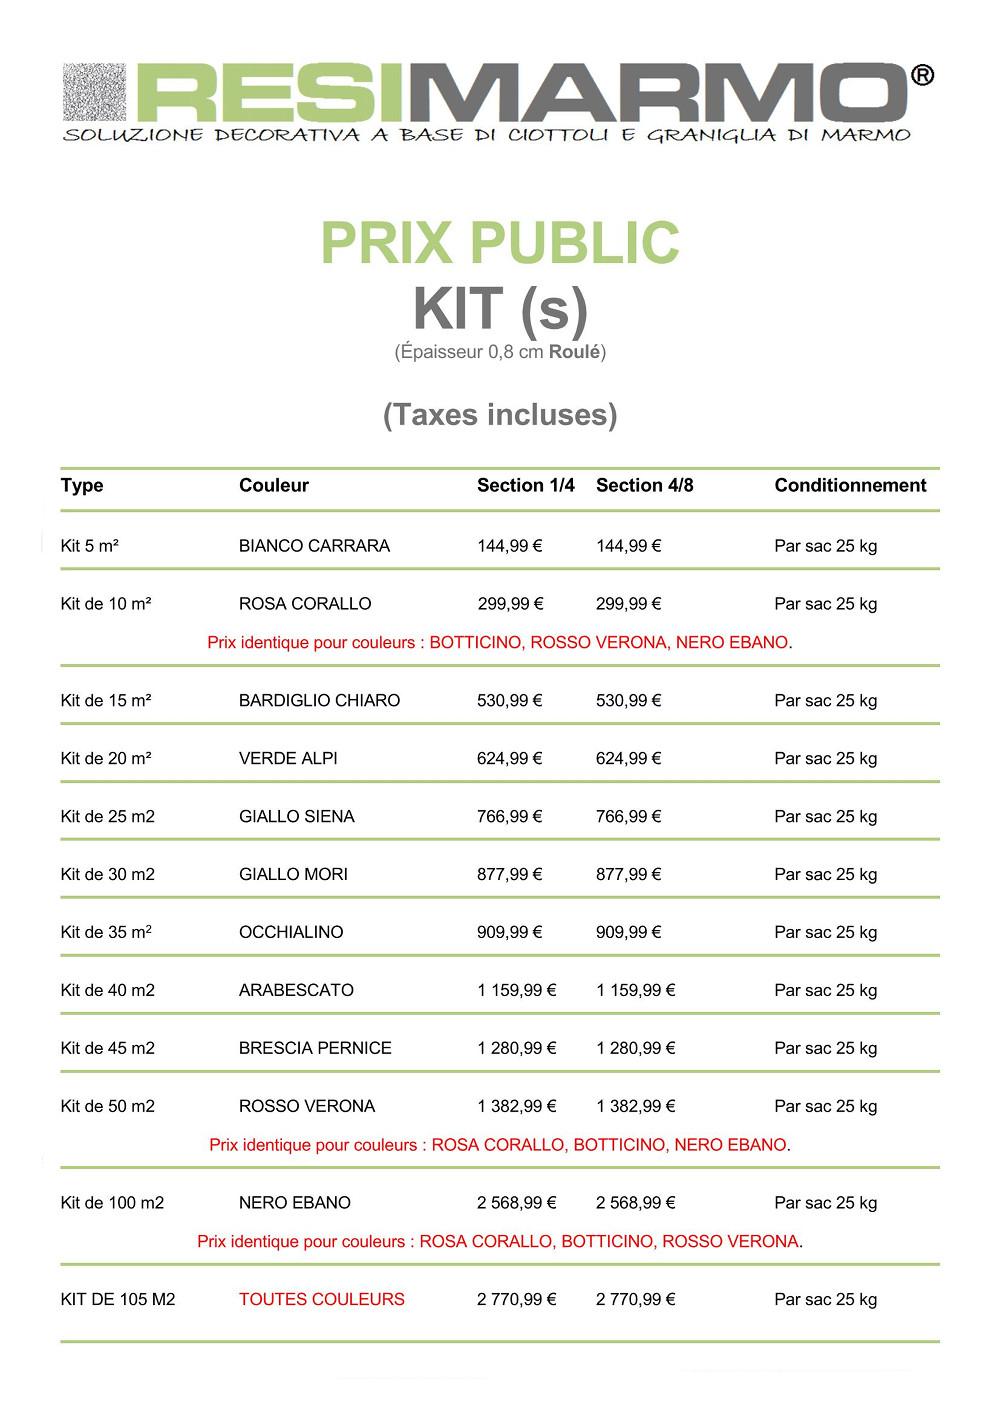 Les Kits RESIMARMO - Prix public des kits RESIMARMO